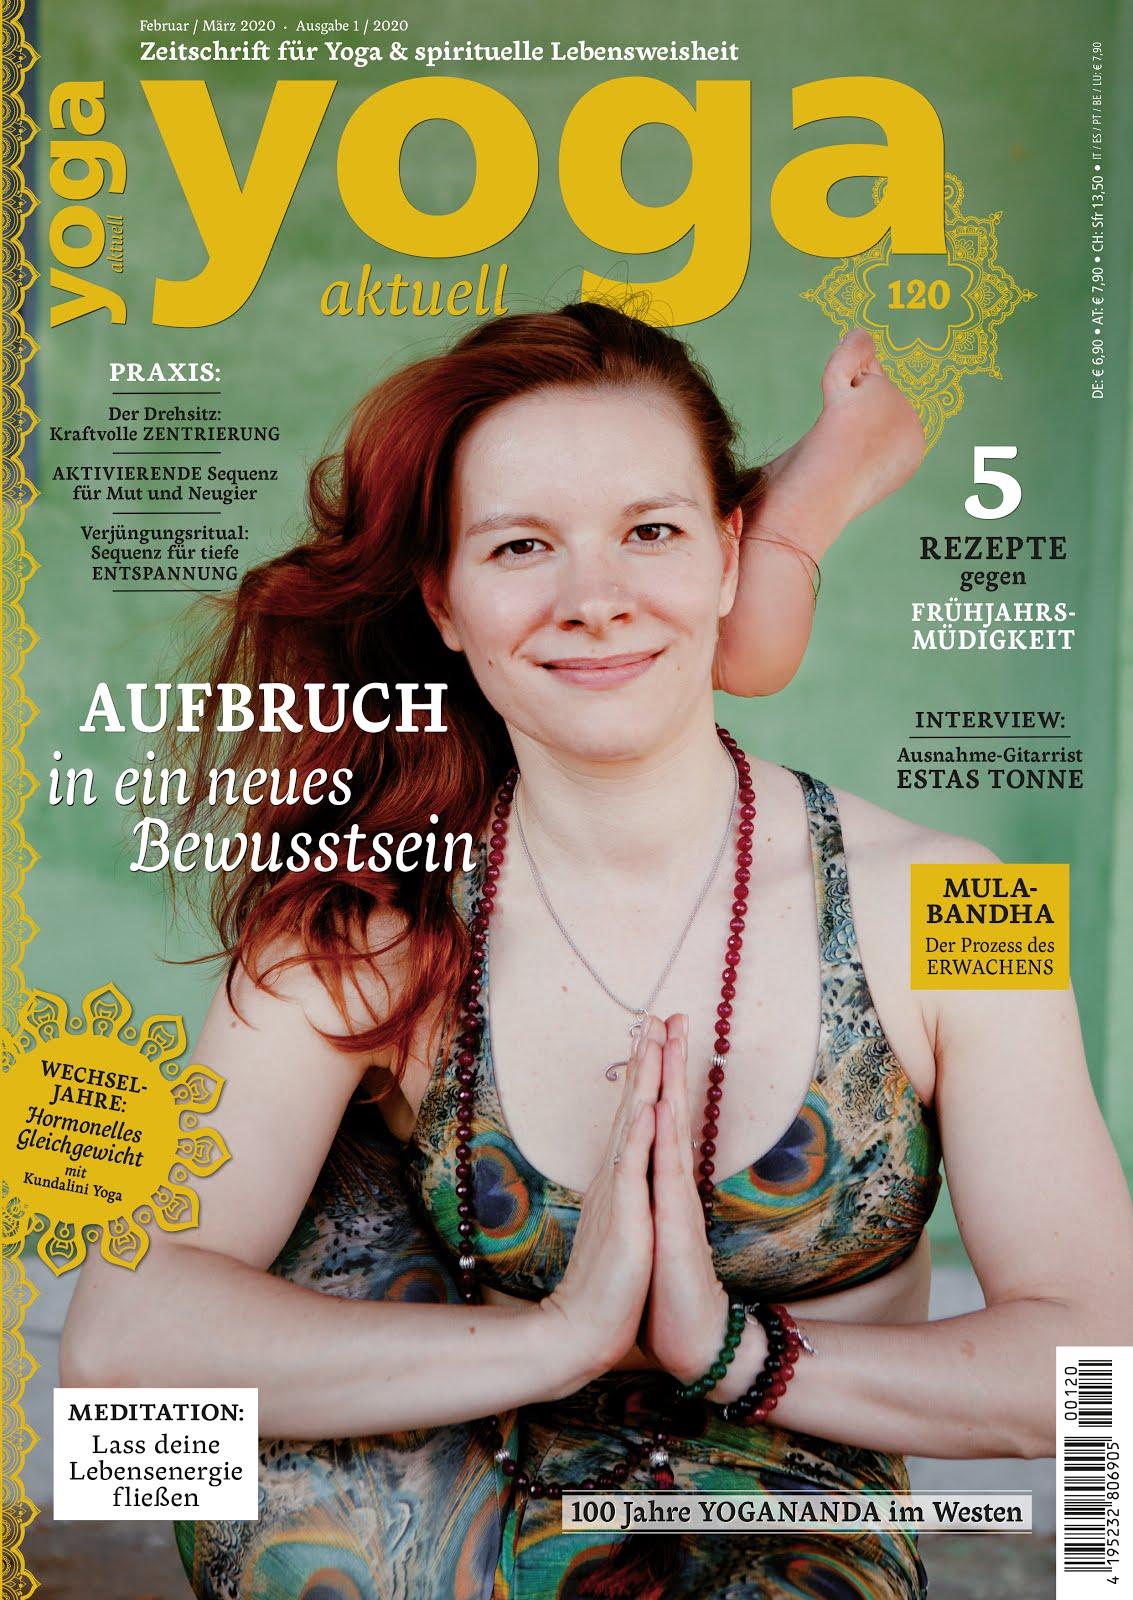 My articles in<br>Yoga Aktuell Magazine:<br>Eltern-Kind-Beziehunger Heilen<br>Yoga Aktuell 120